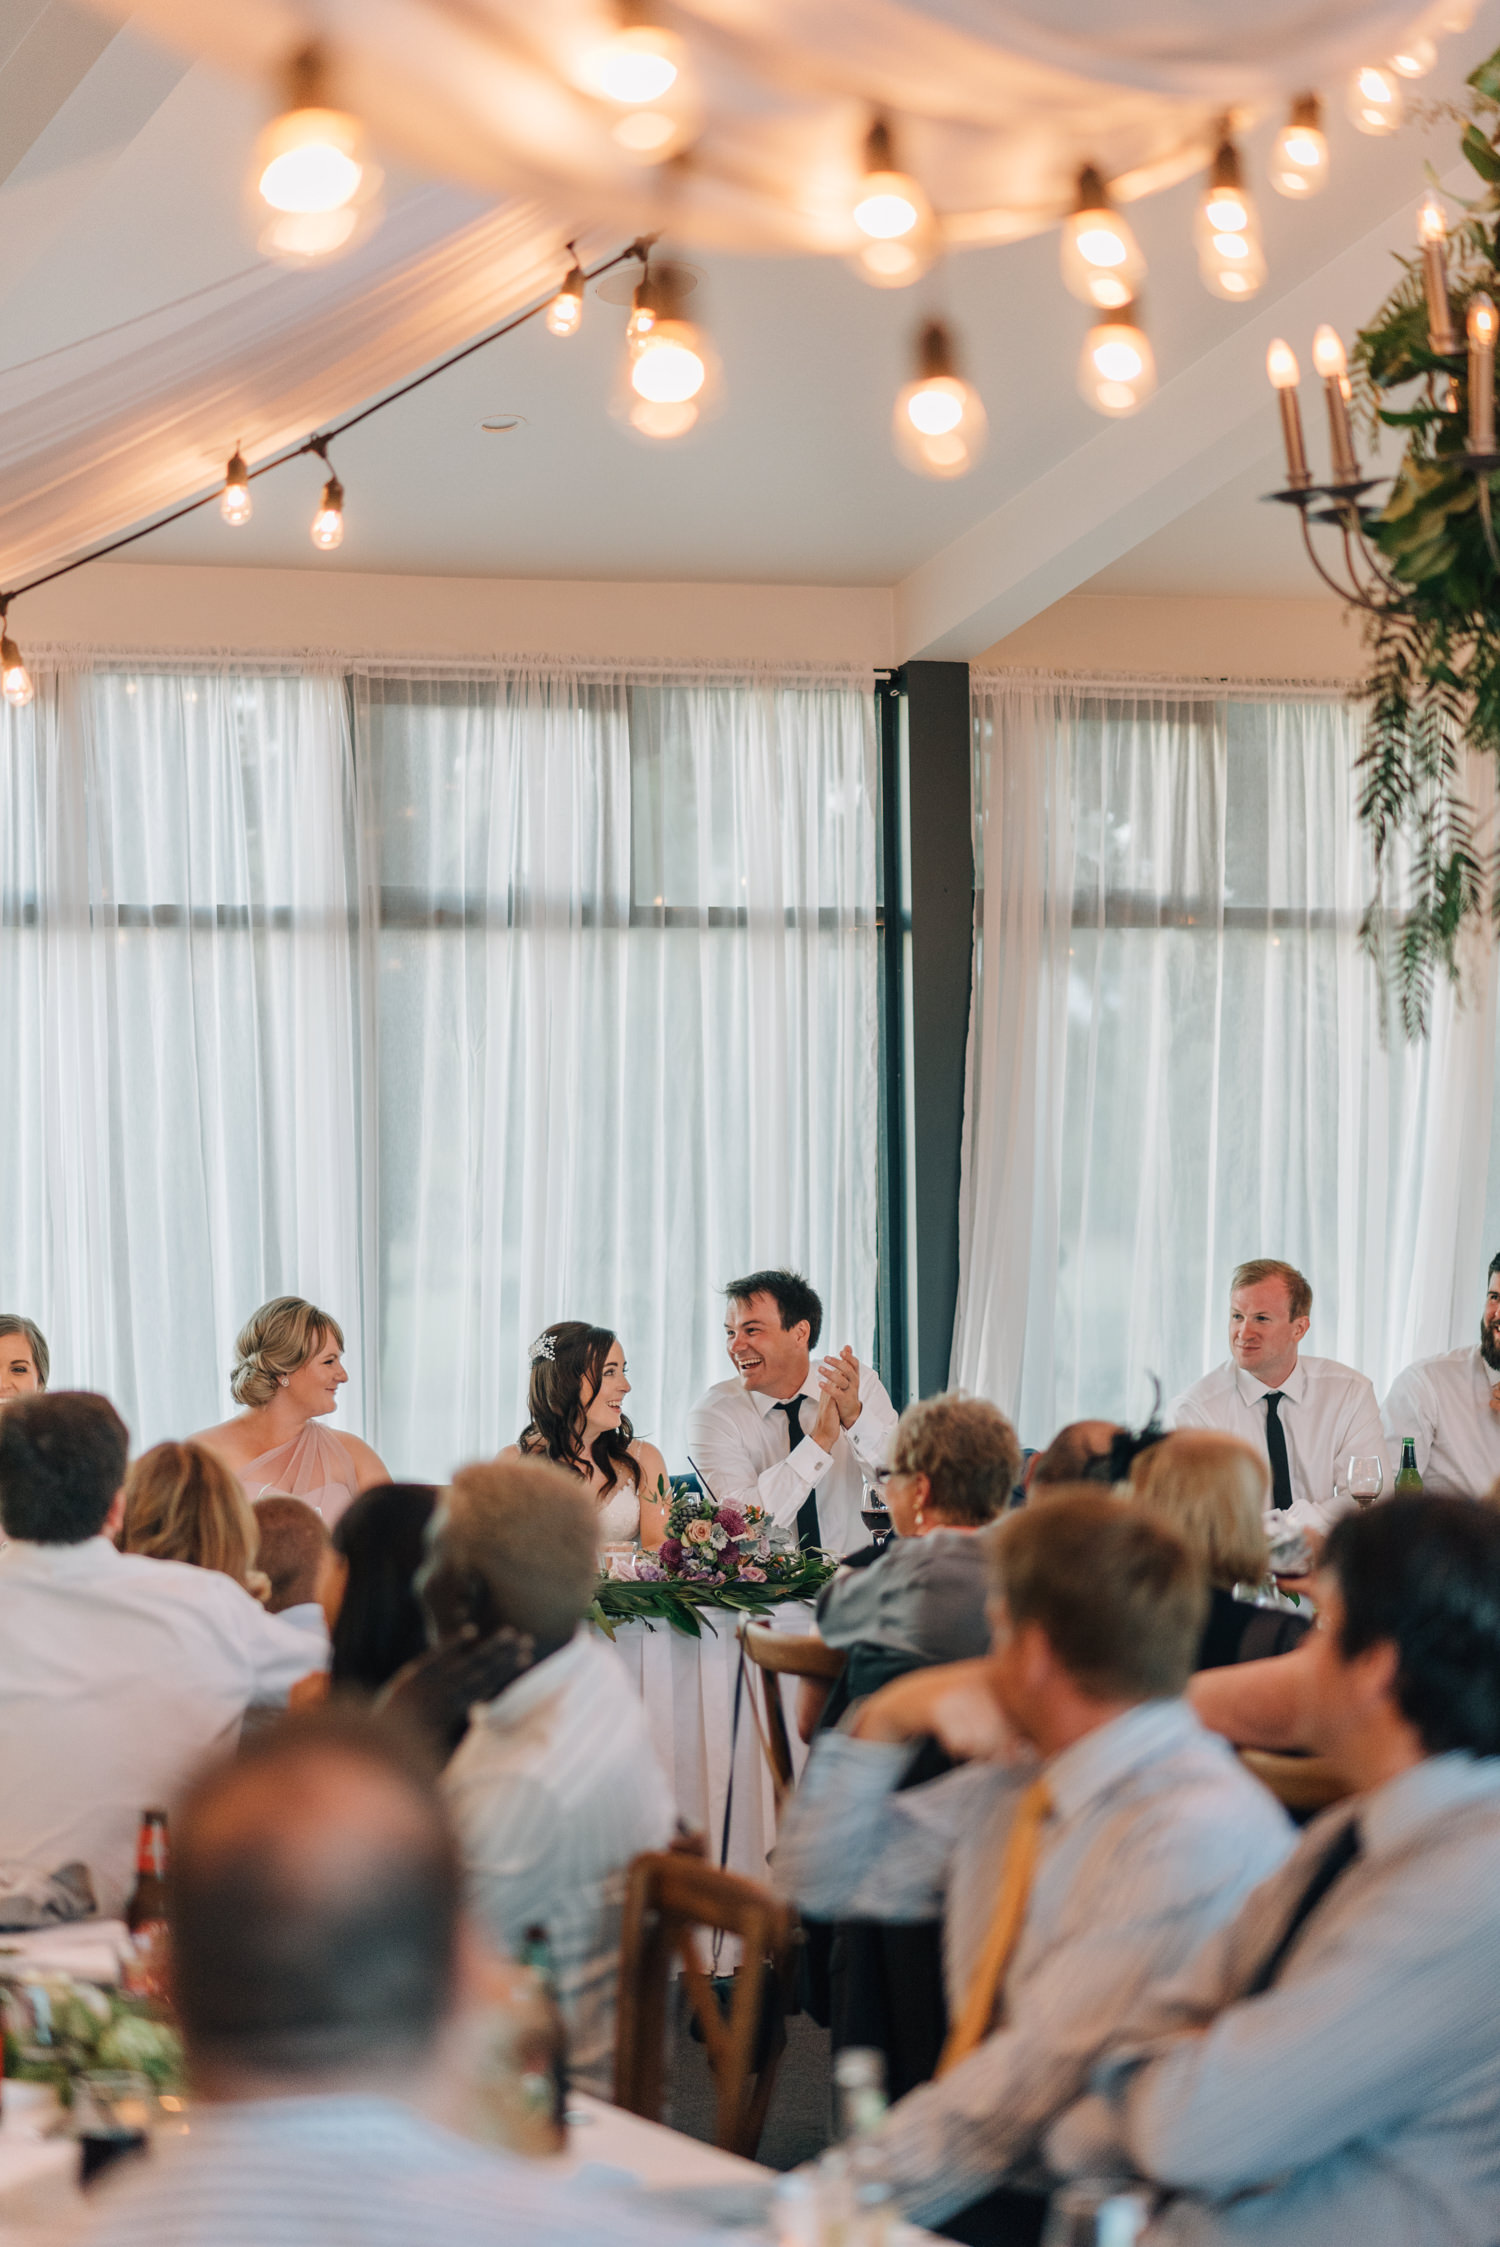 Quamby-Wedding-Photographer-143.jpg